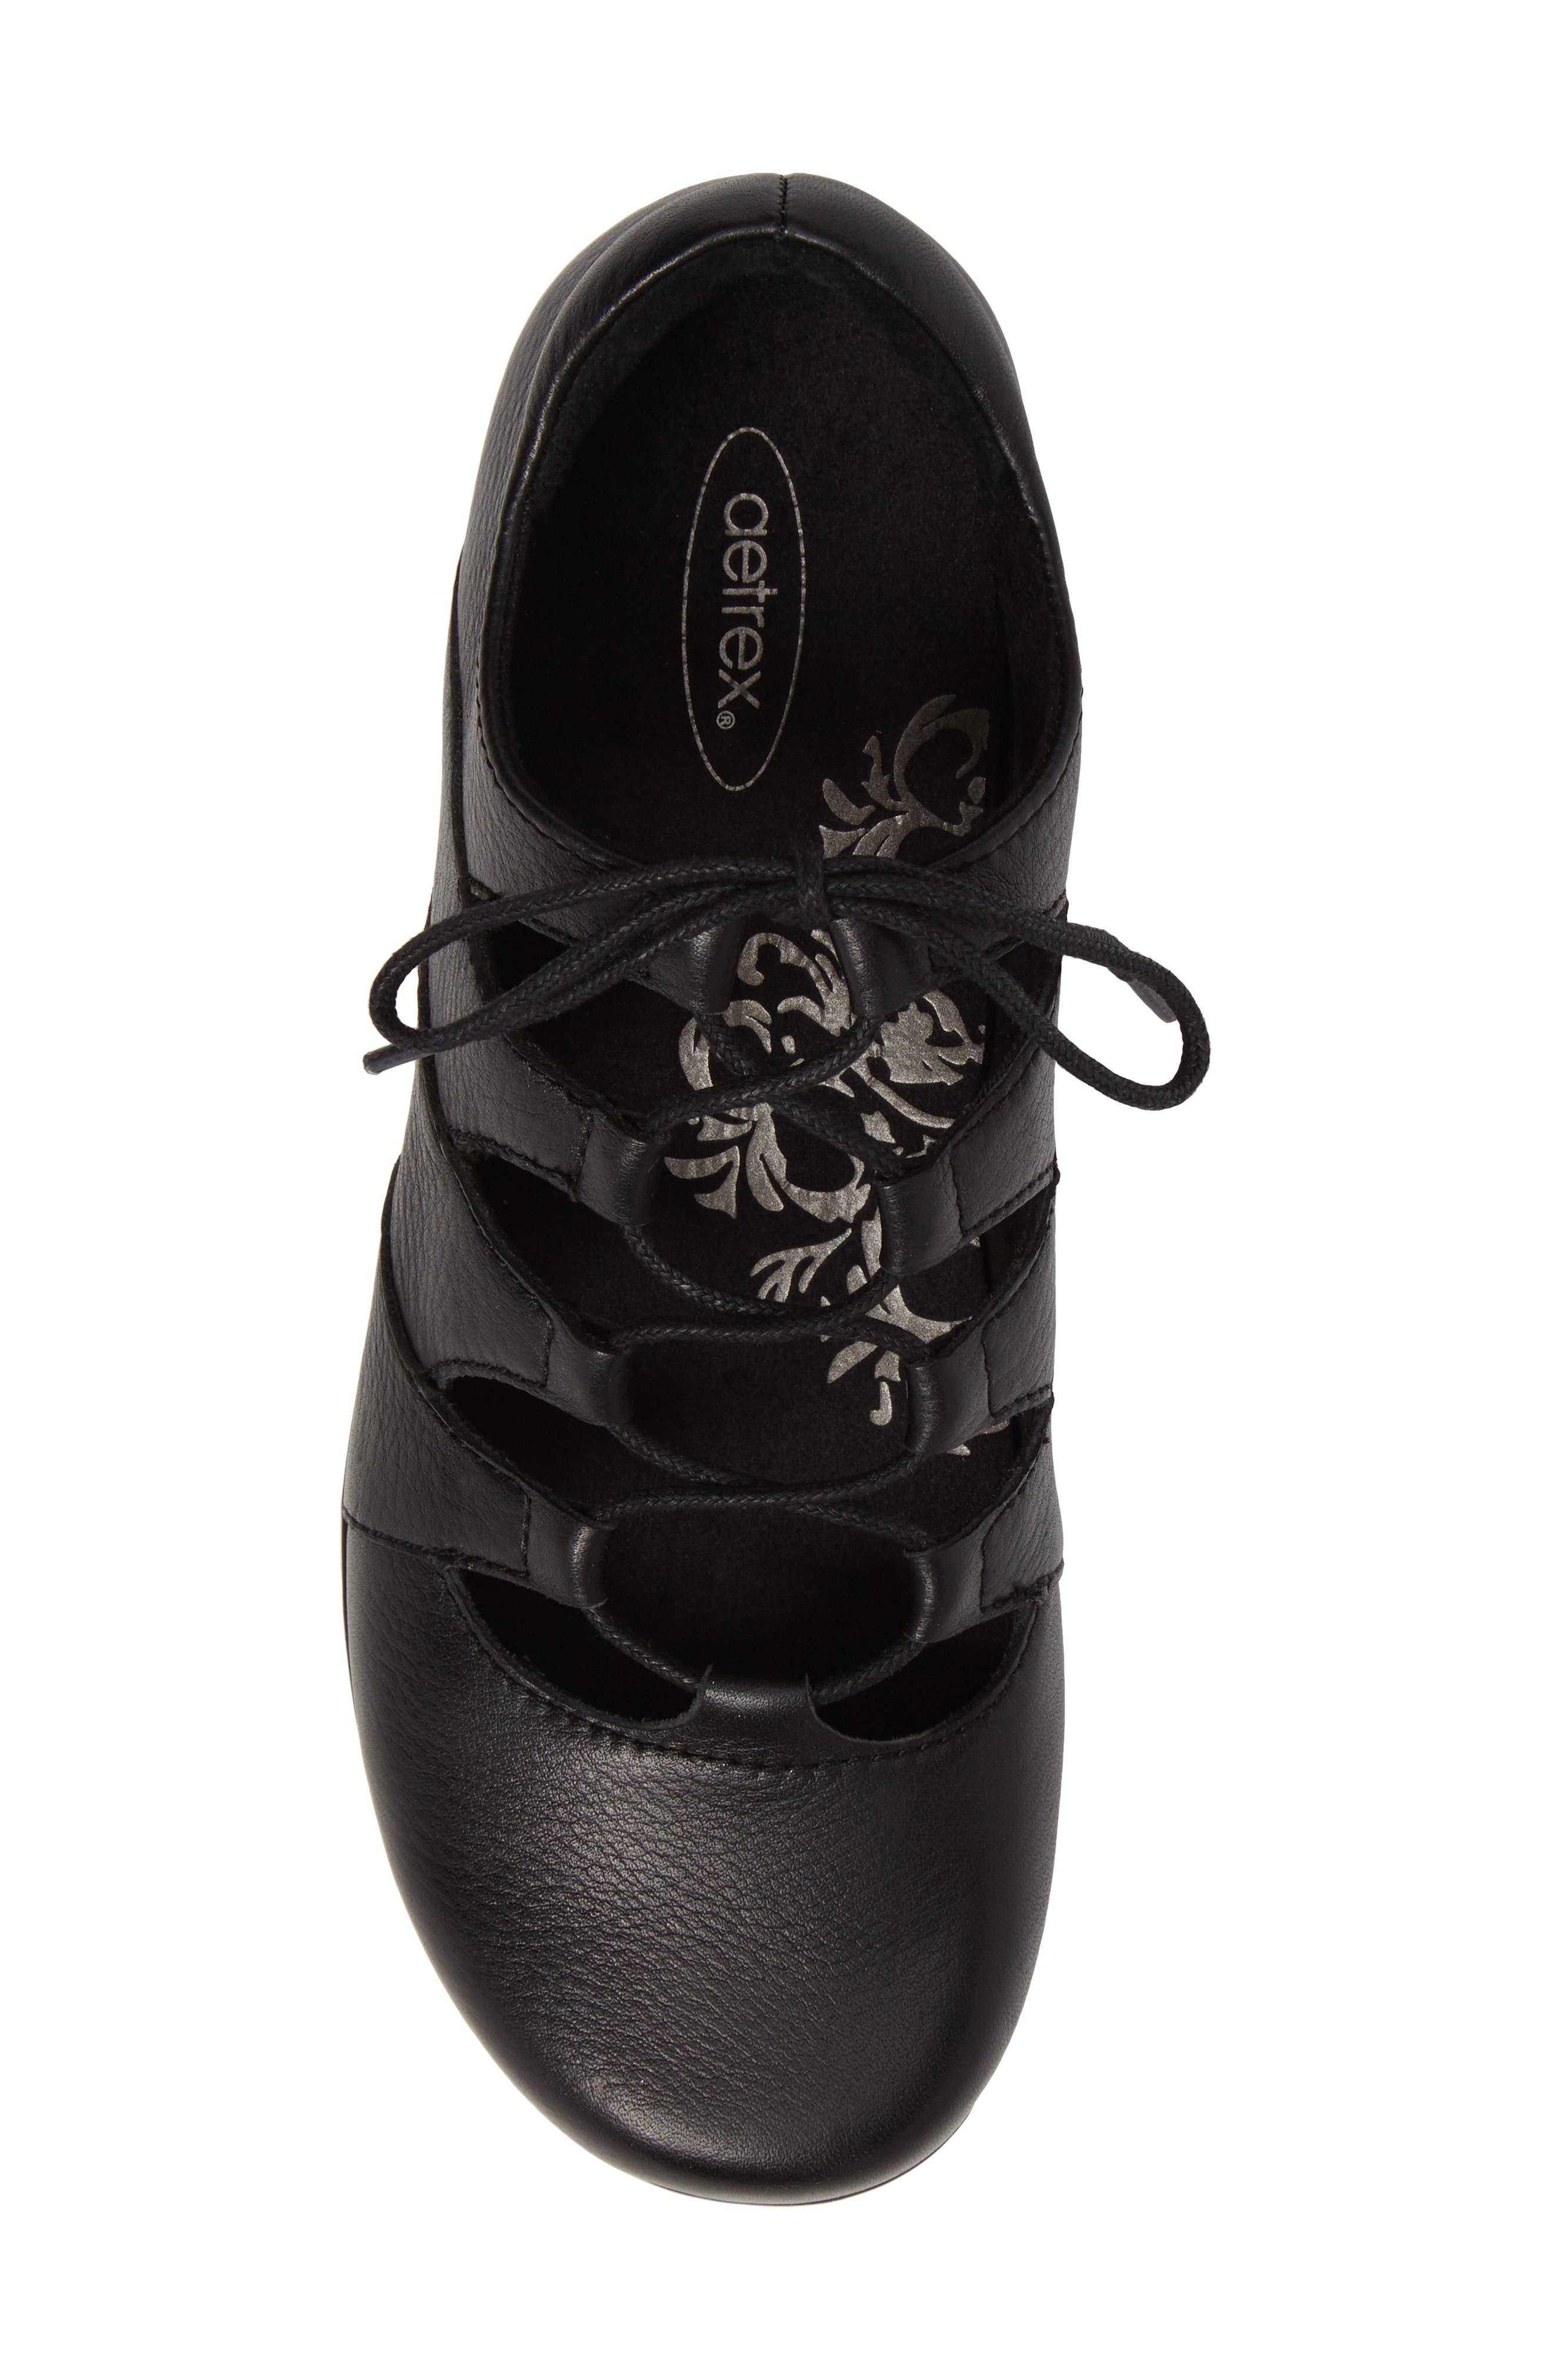 AETREX, Sienna Cutout Sneaker, Alternate thumbnail 5, color, BLACK LEATHER/ BLACK